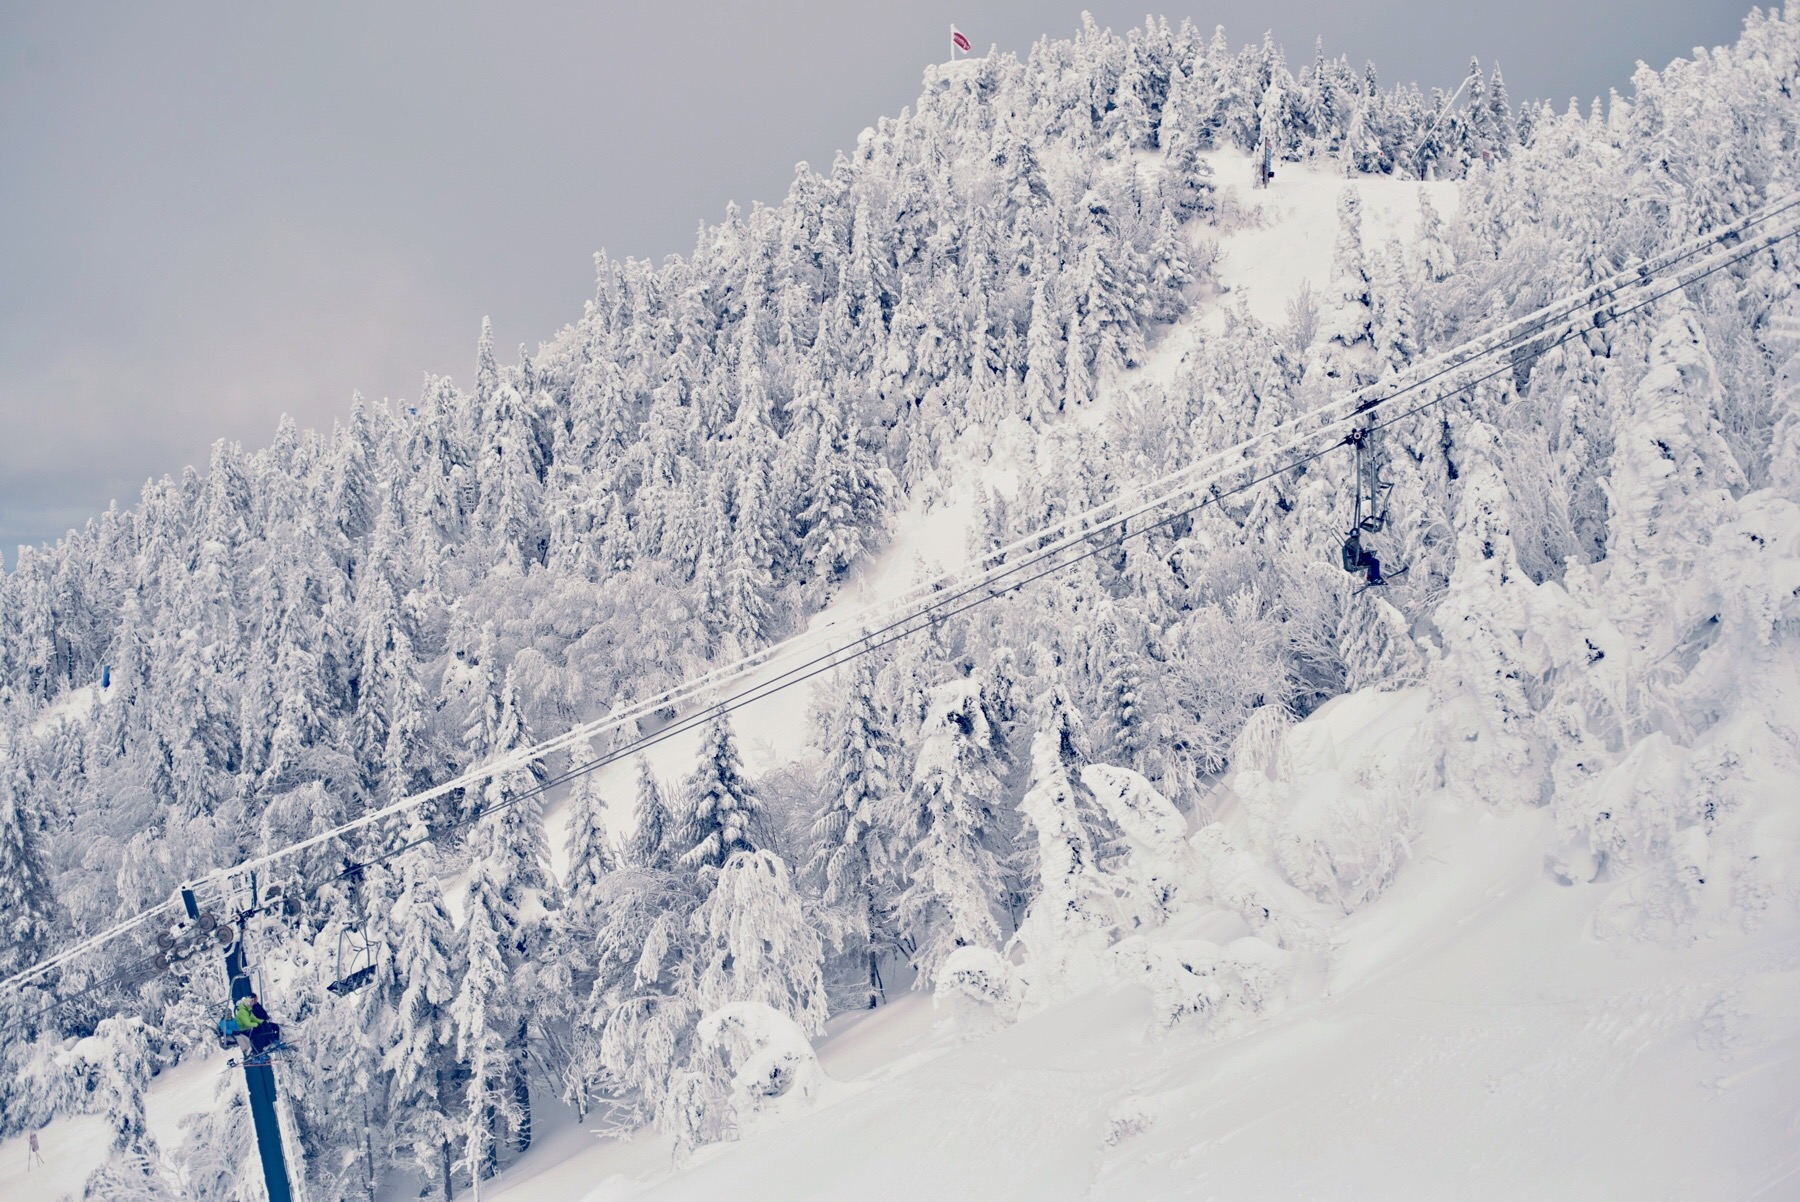 Canada: Winter in Mont-TreMblant, Ottawa -